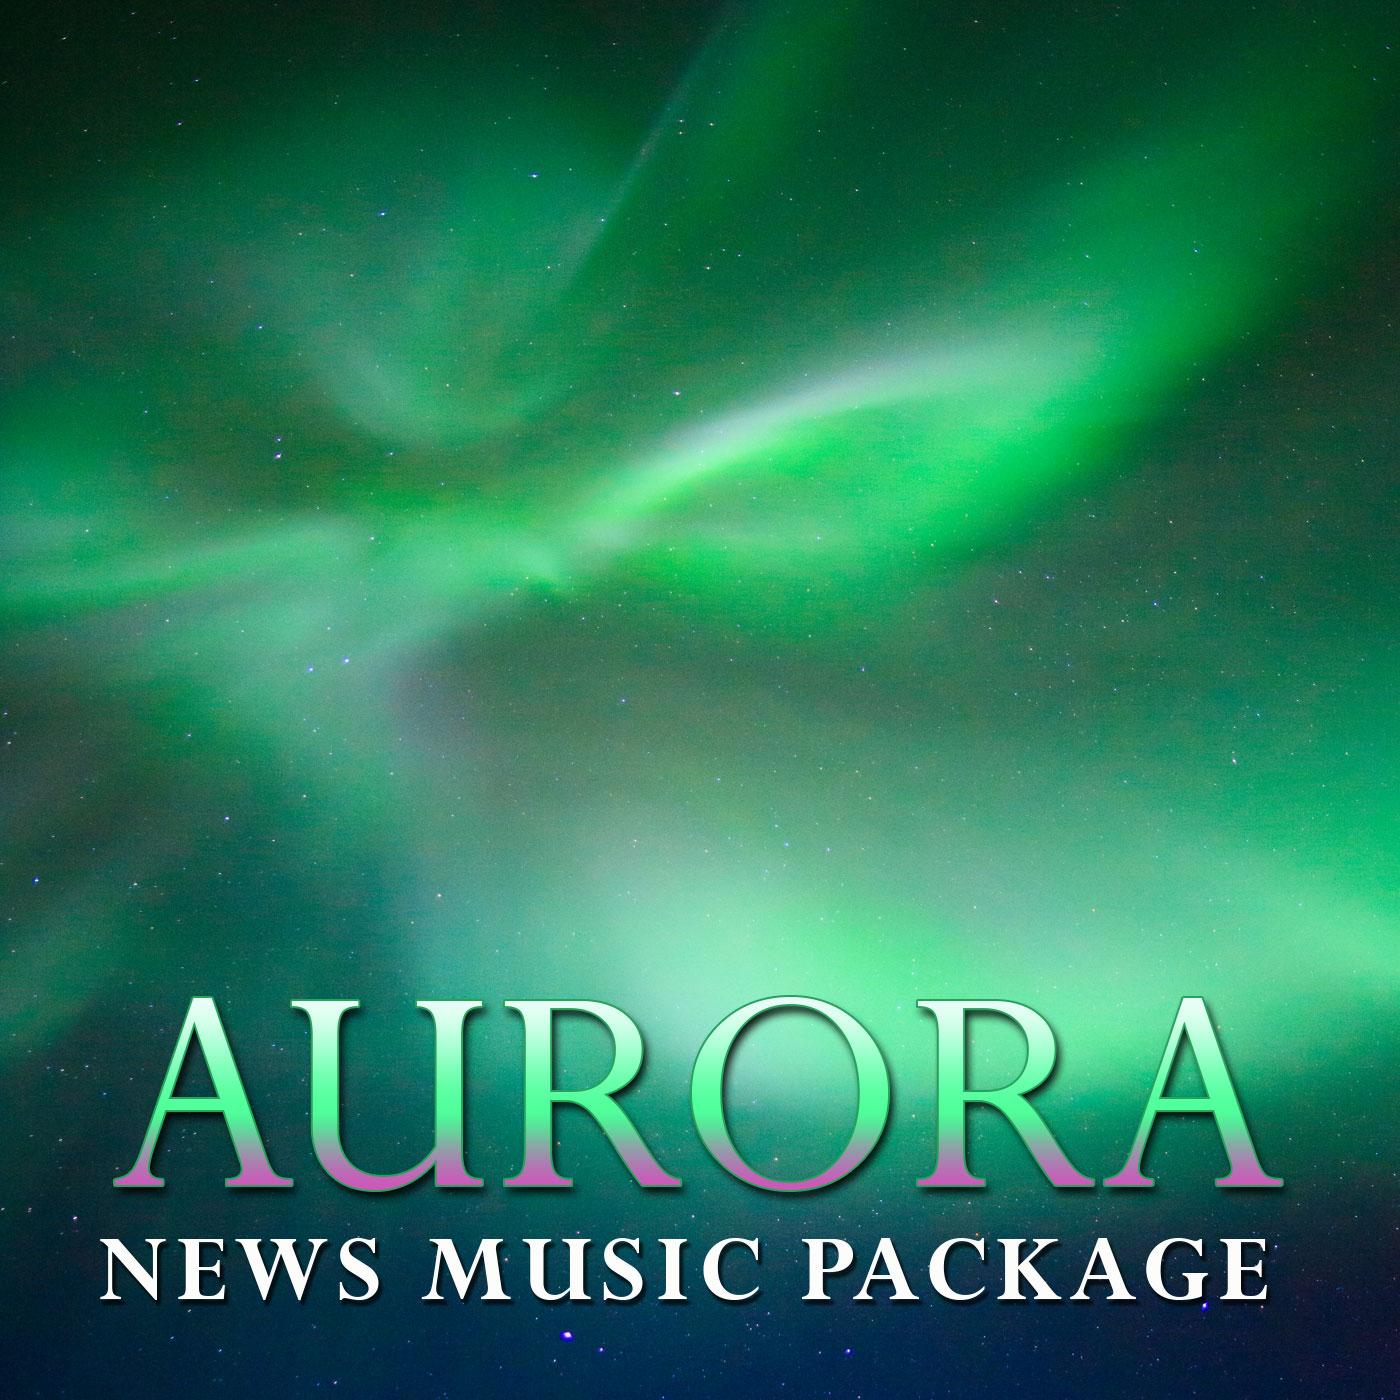 Aurora News Music Package